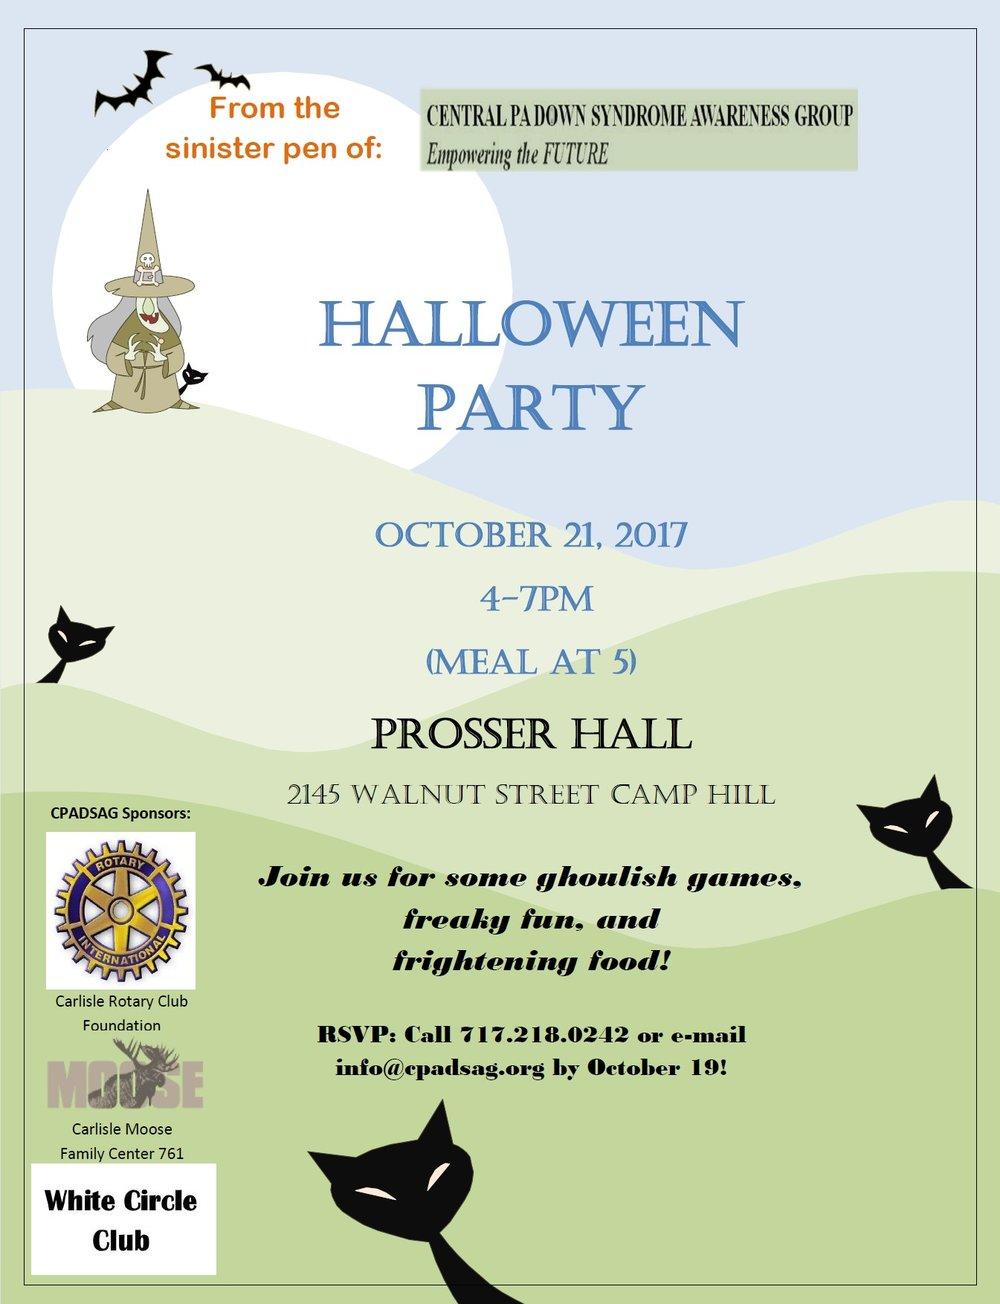 CPADSAG Halloween Flyer 17.jpg